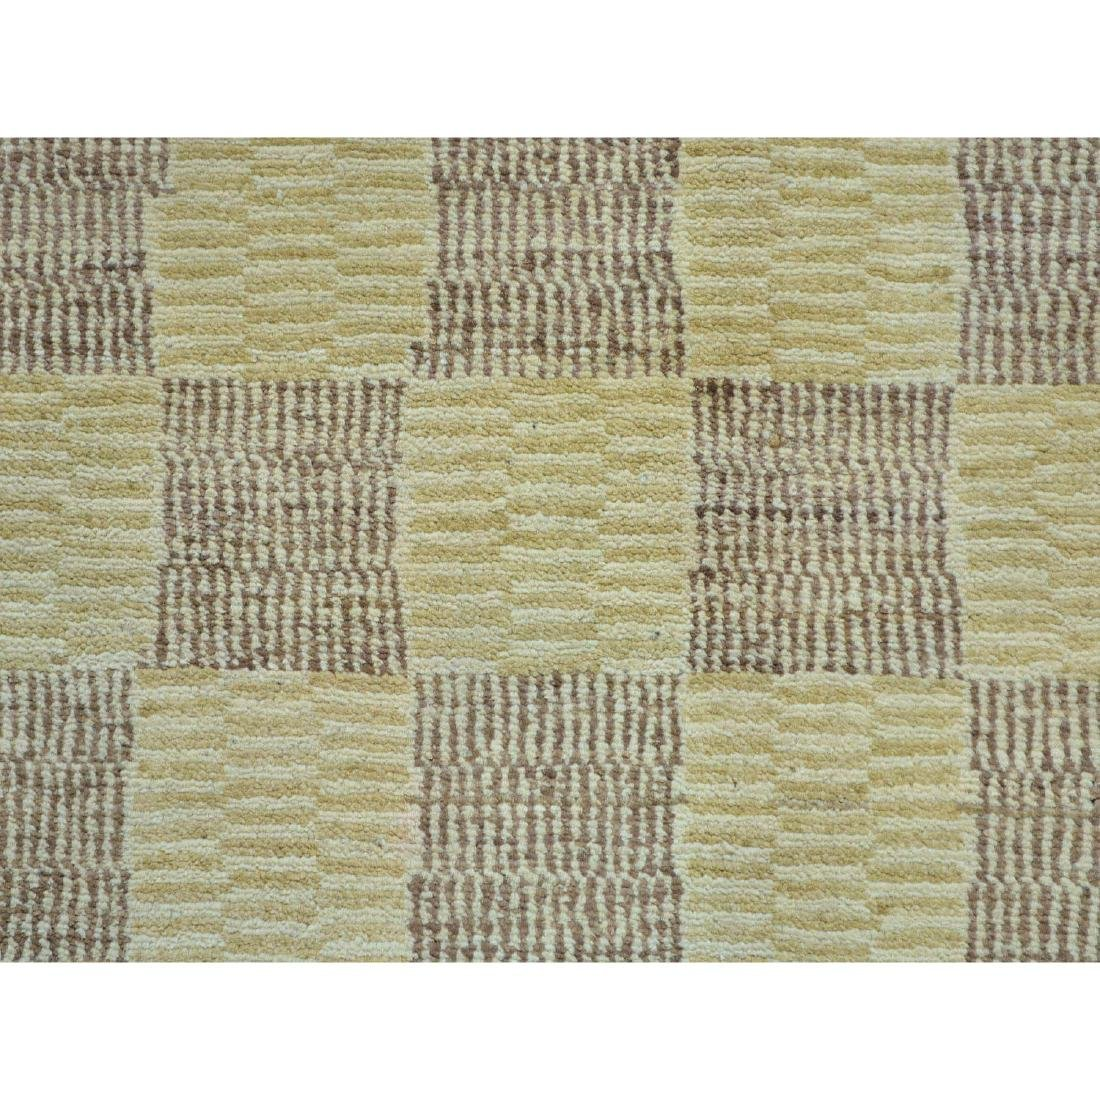 Peshawar Gabbeh Hand Knotted Pure Wool Oriental Rug - 4